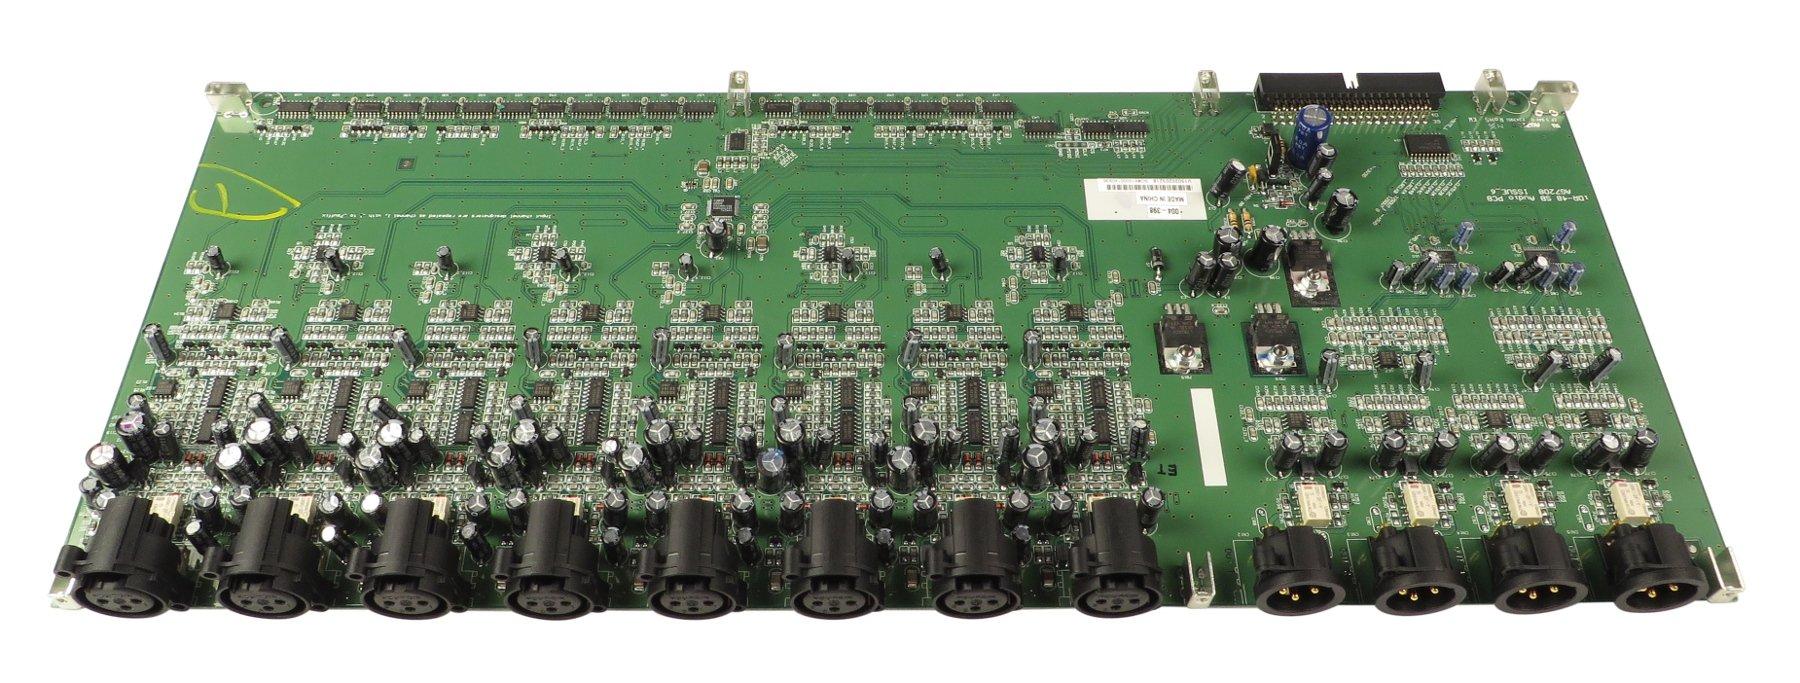 IDR32 and IDR48 Audio I/O PCB Assembly